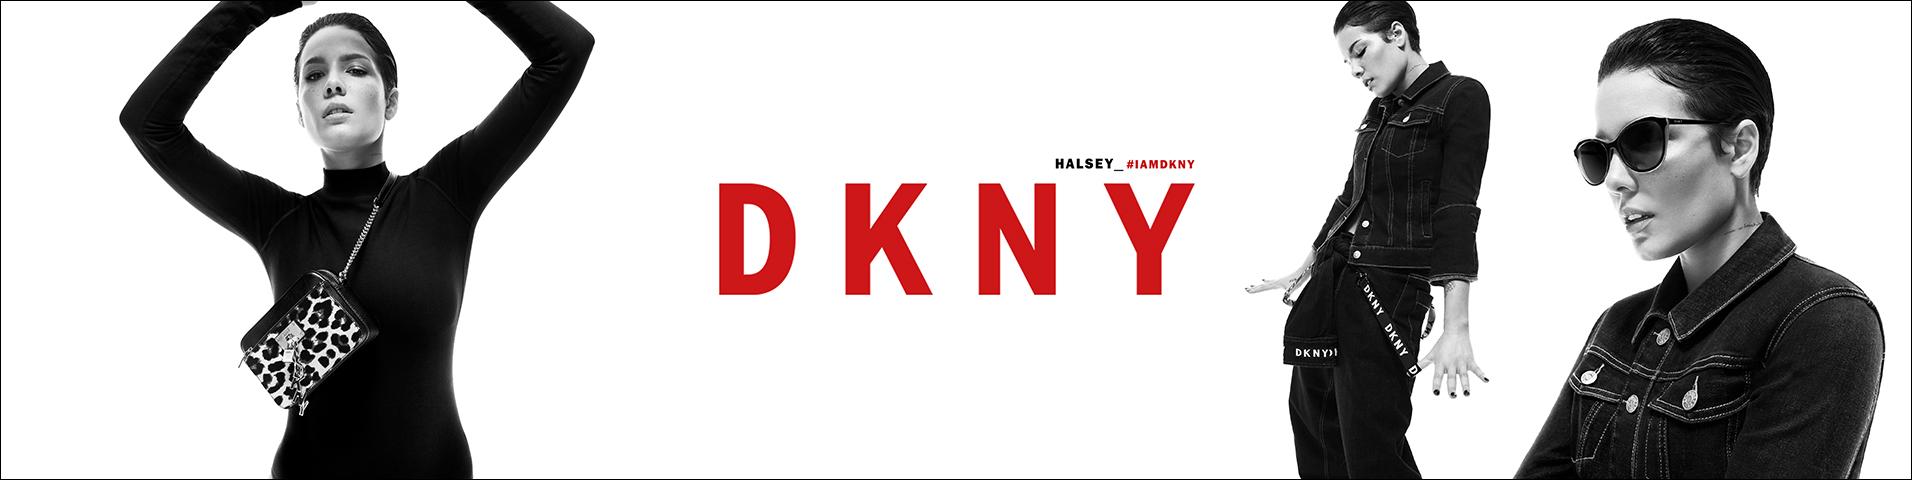 Details zu DKNY Donna Karan Damen Jacke Kurzmantel Größe XS dunkelblau NEU